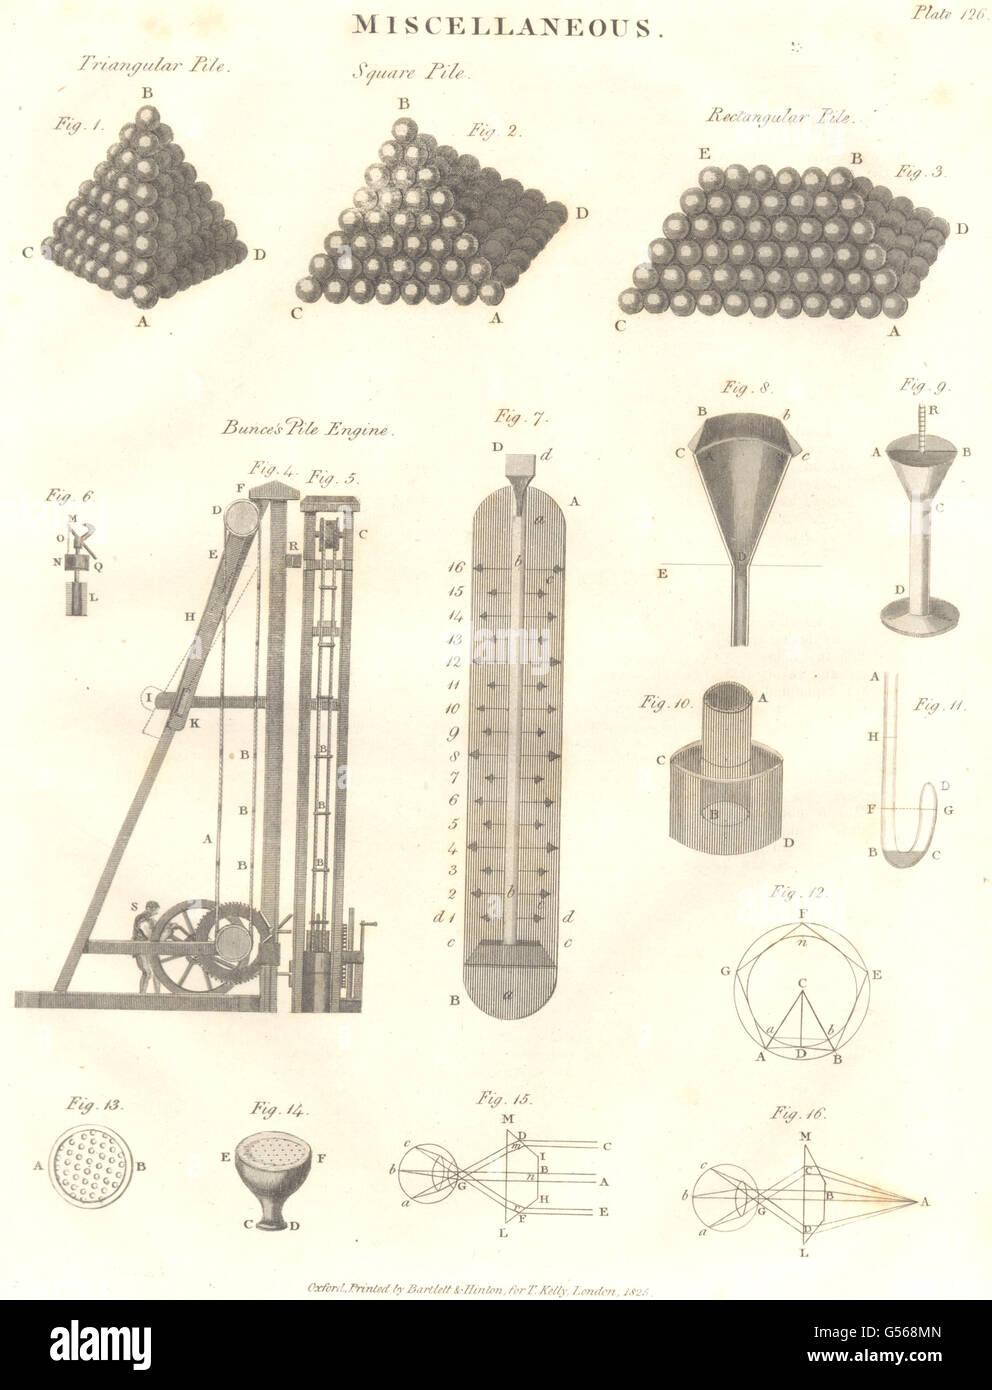 SCIENCE: Triangular, Square & Rectangular piles. Bunce's Pile Engine, 1830 - Stock Image